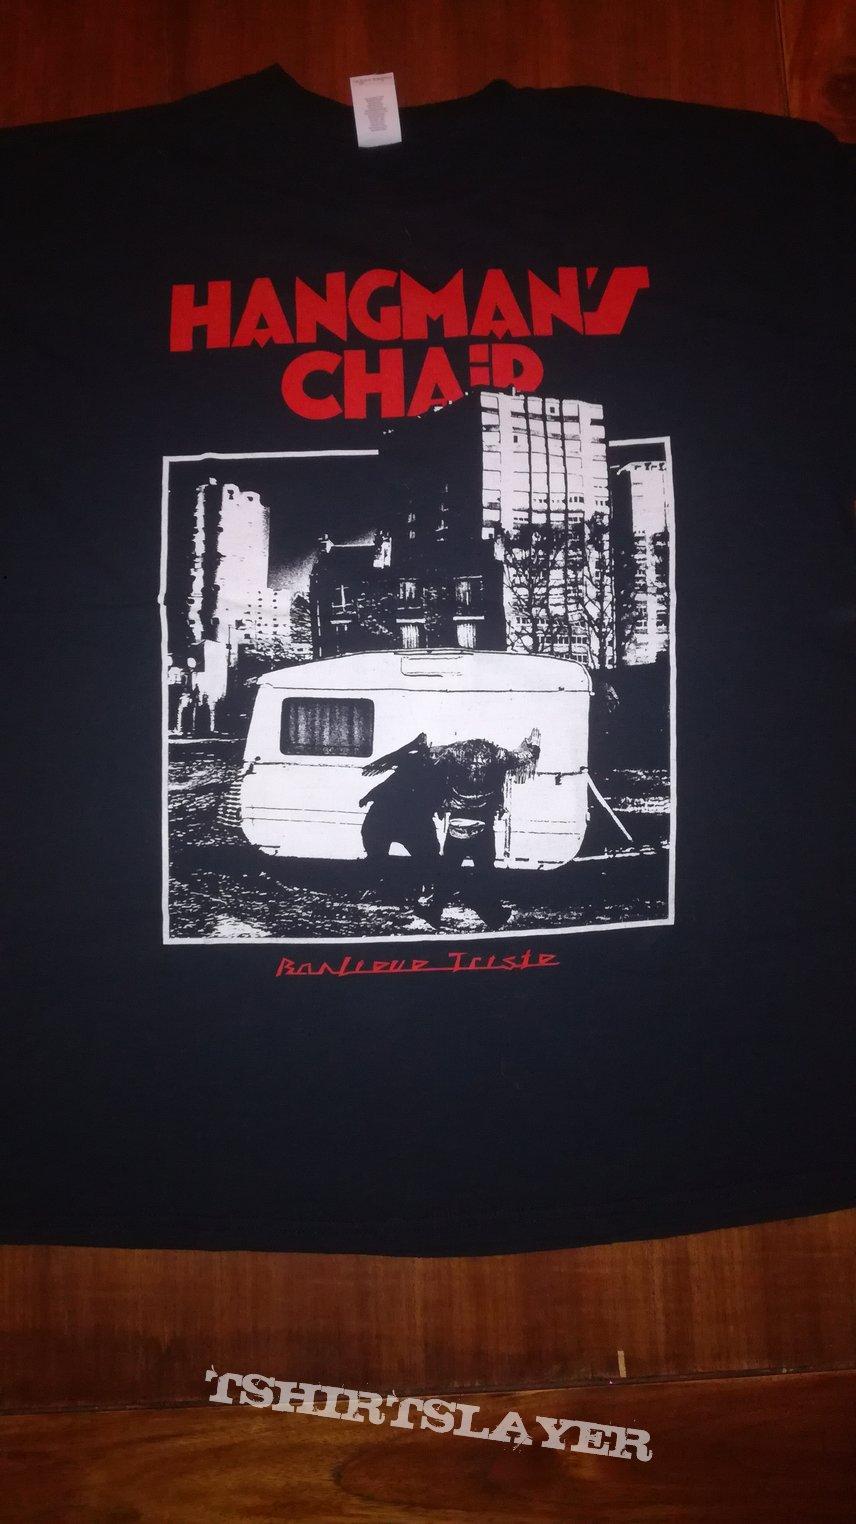 Hangman's Chair - Banlieue Triste - 2018 tour shirt